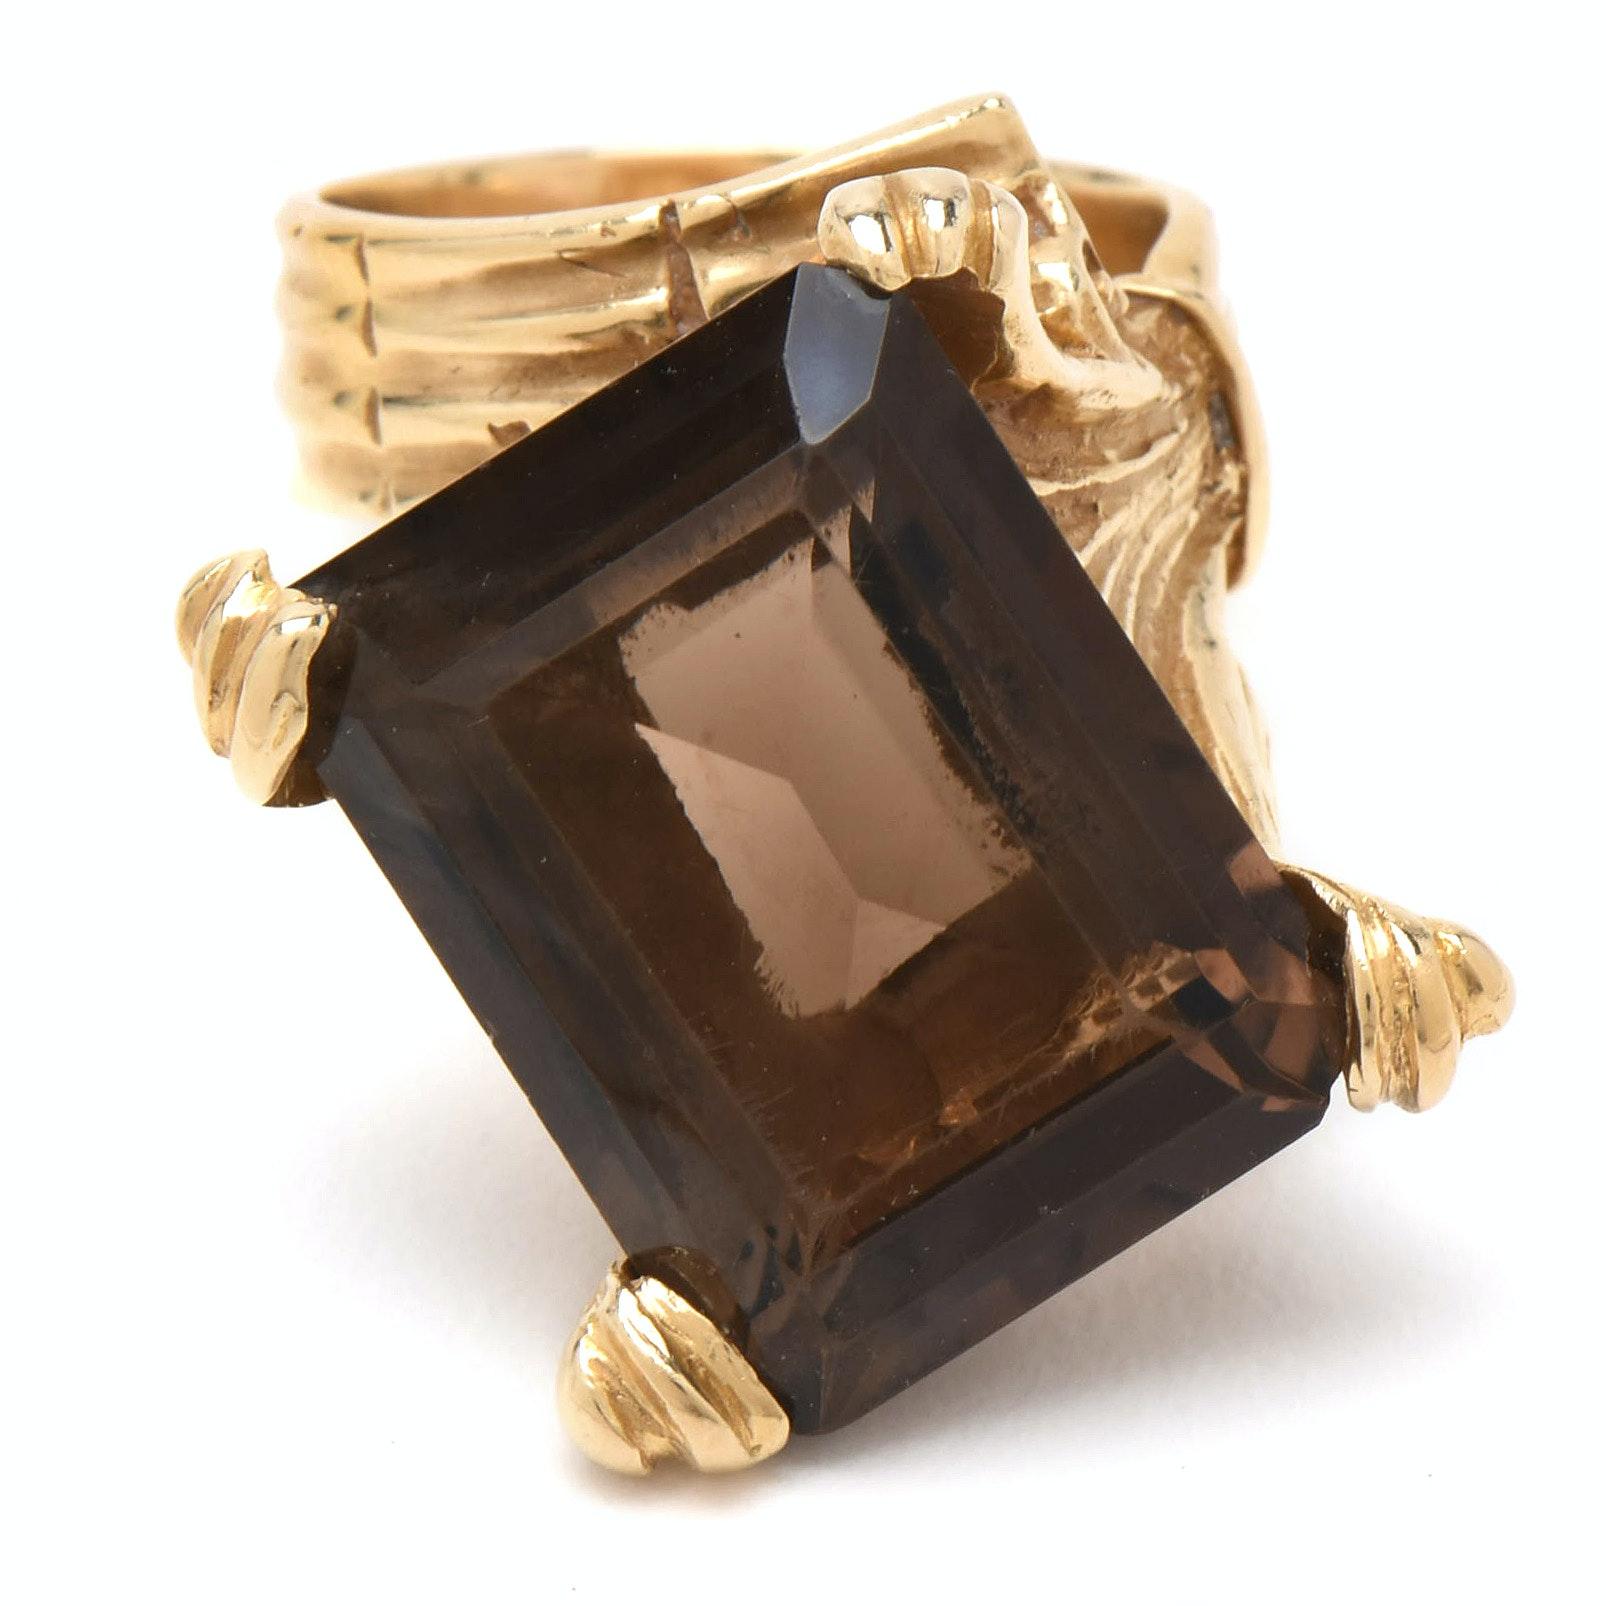 Vintage 14K Yellow Gold 18.72 CT Smoky Quartz Statement Ring